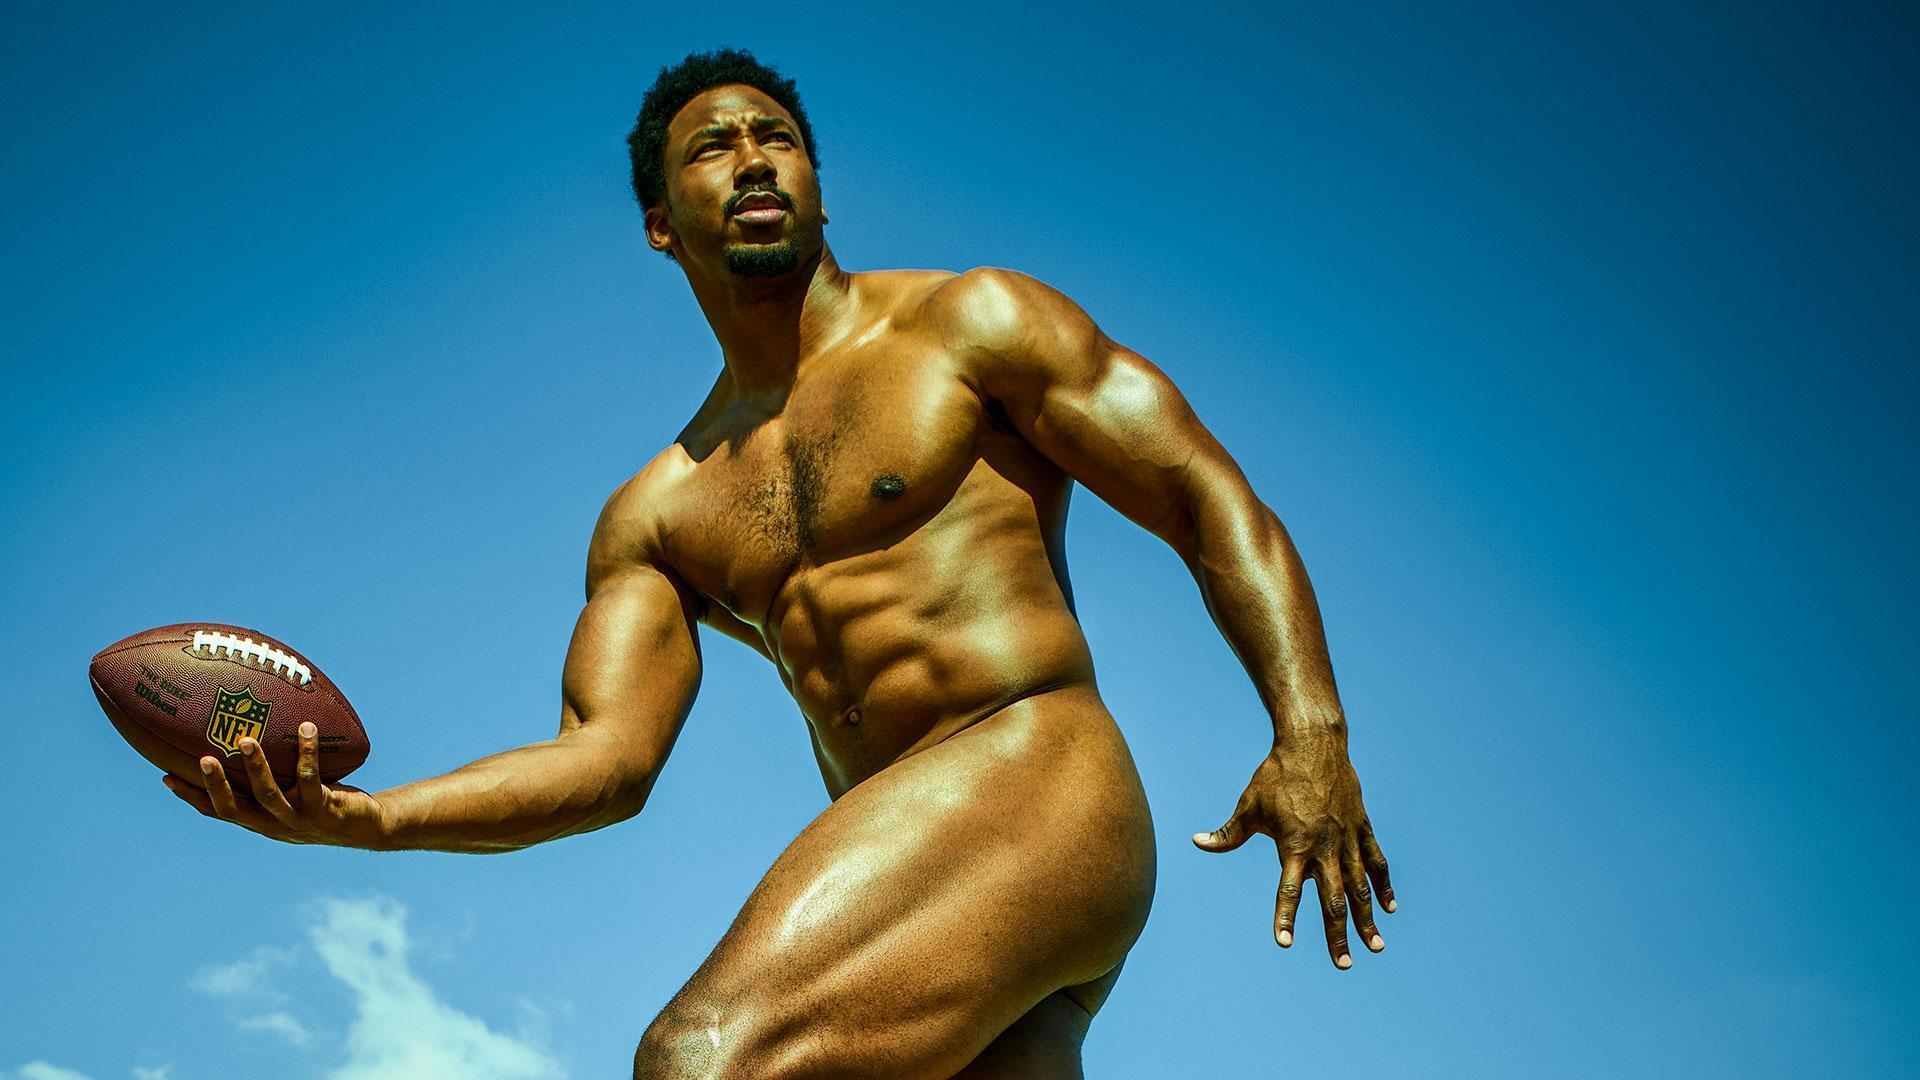 Behind the scenes of Myles Garrett's Body Issue shoot